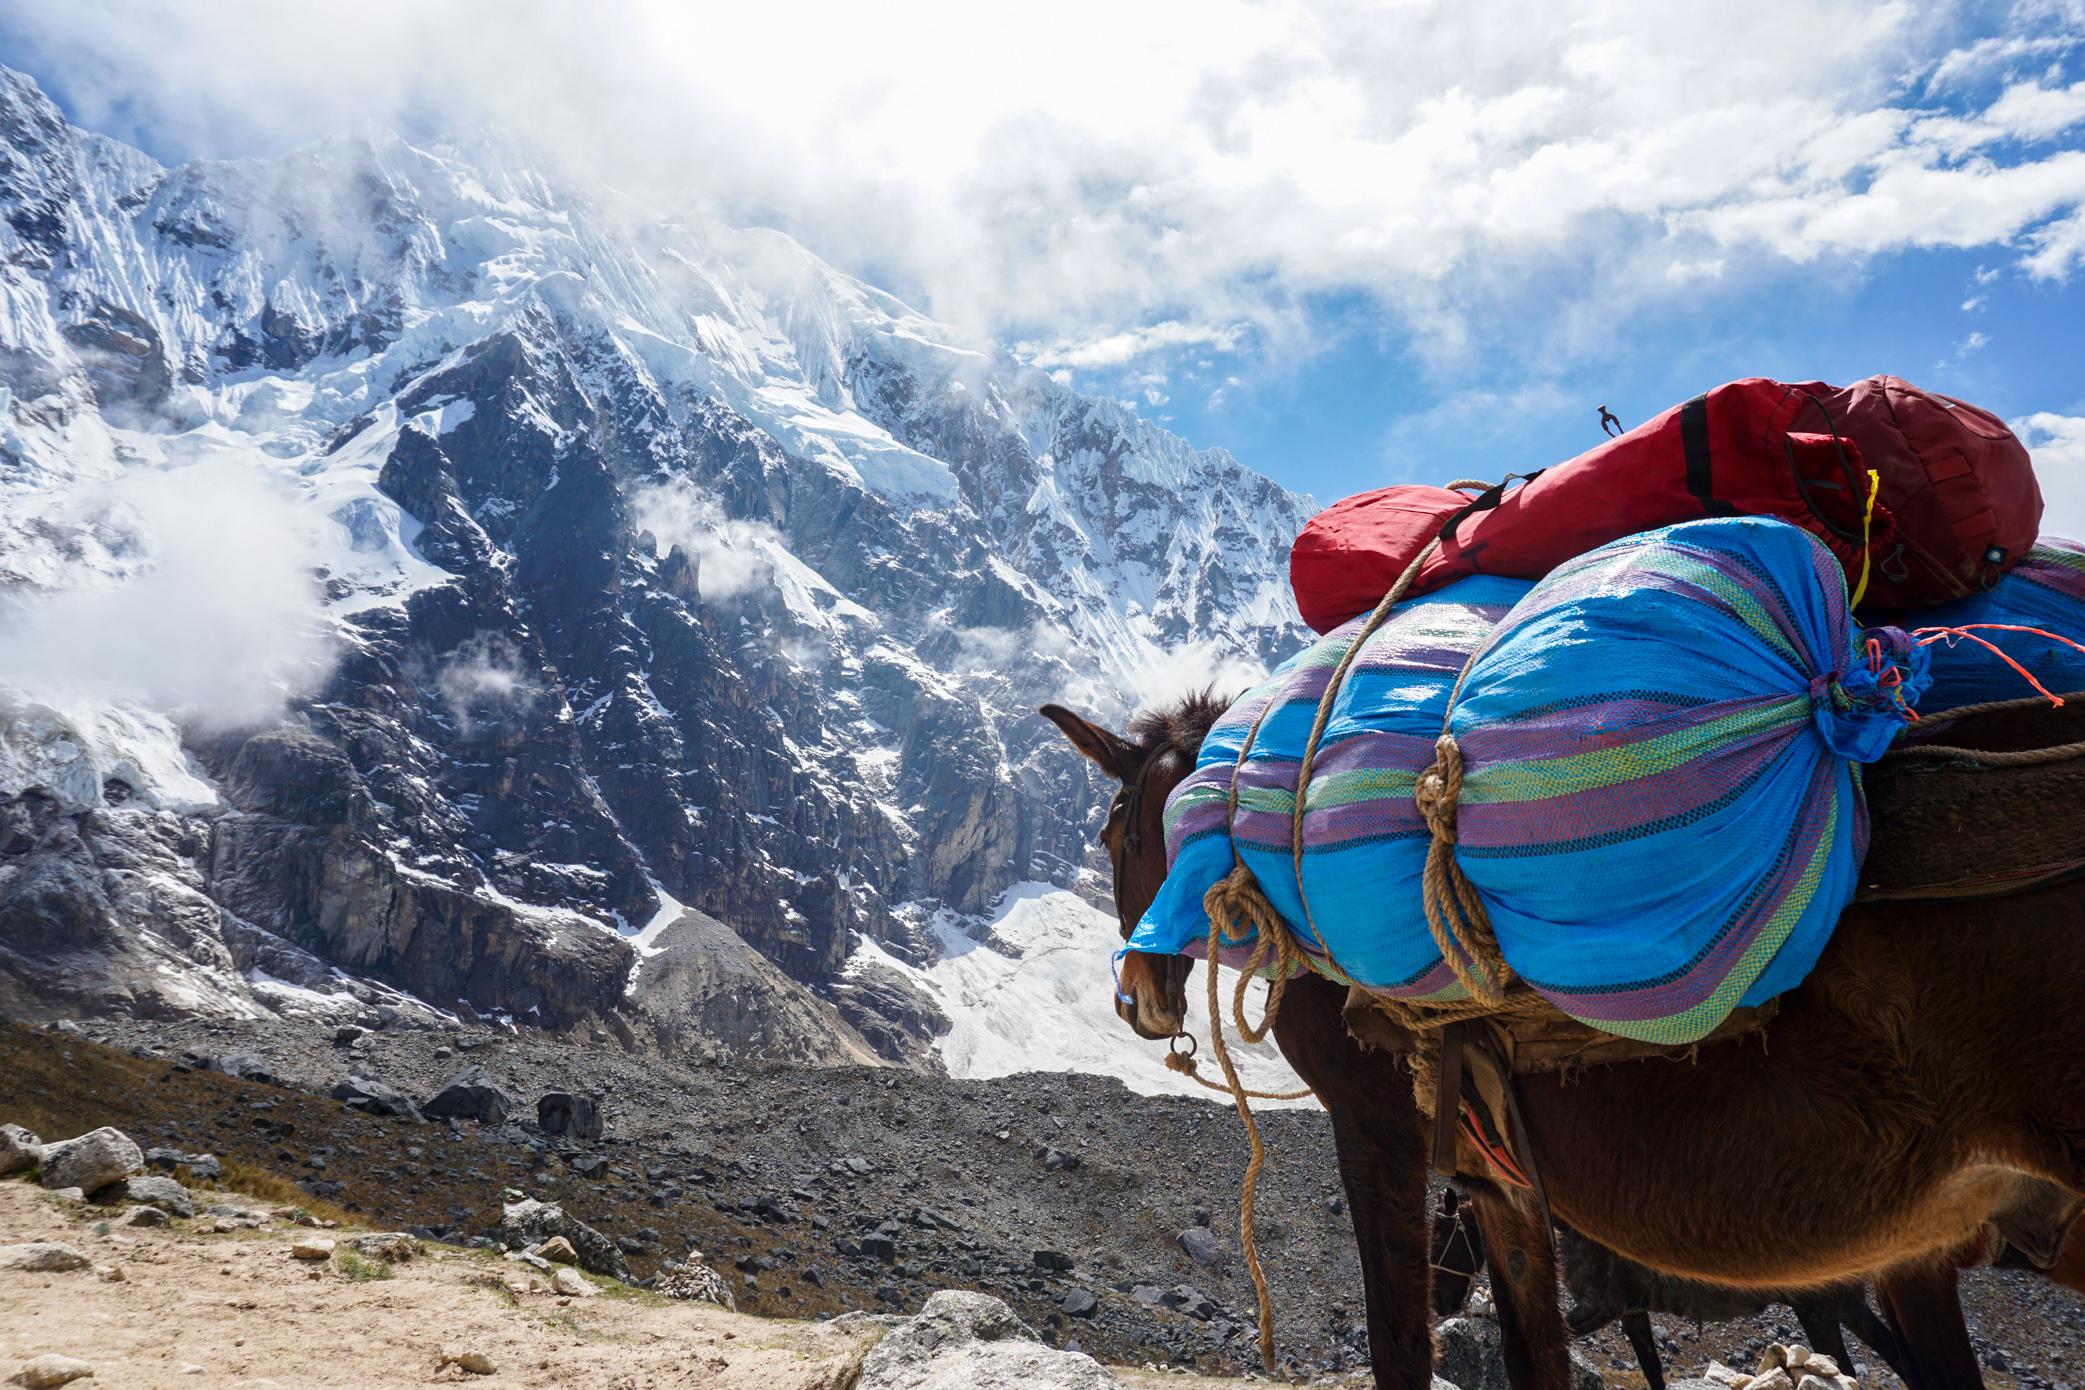 Peru - rundreise med vandring i Salkantay Lima, Machu Picchu, Cuzco, Aguas Calientes, Puno og Titicacasjøen